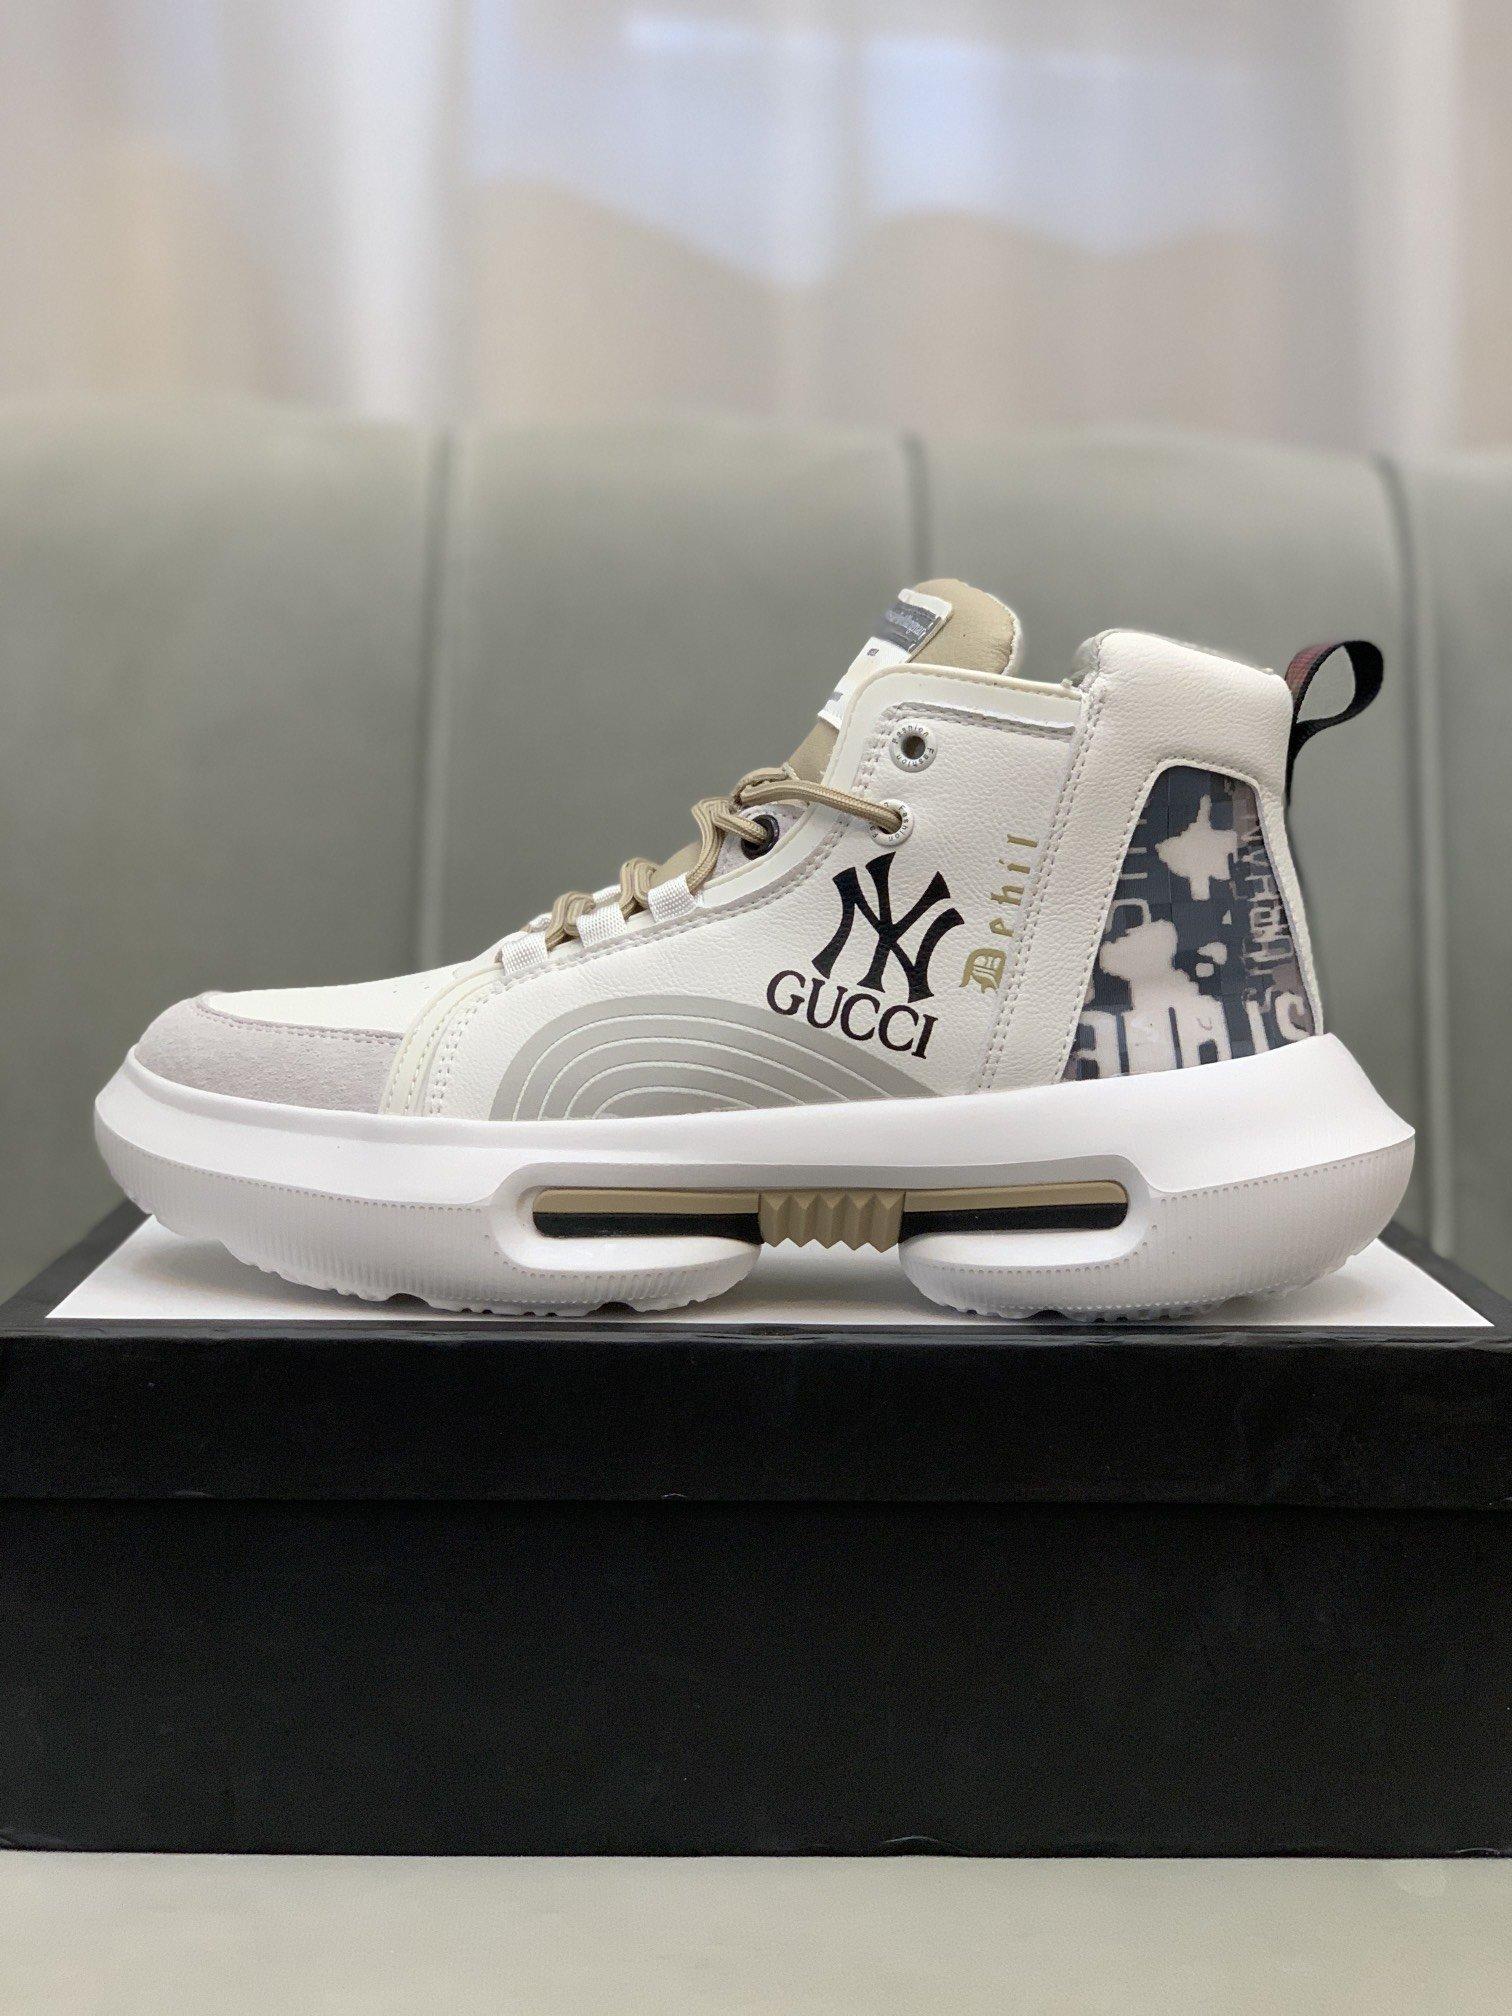 Gucc*古奇*高帮休闲鞋正码码数: